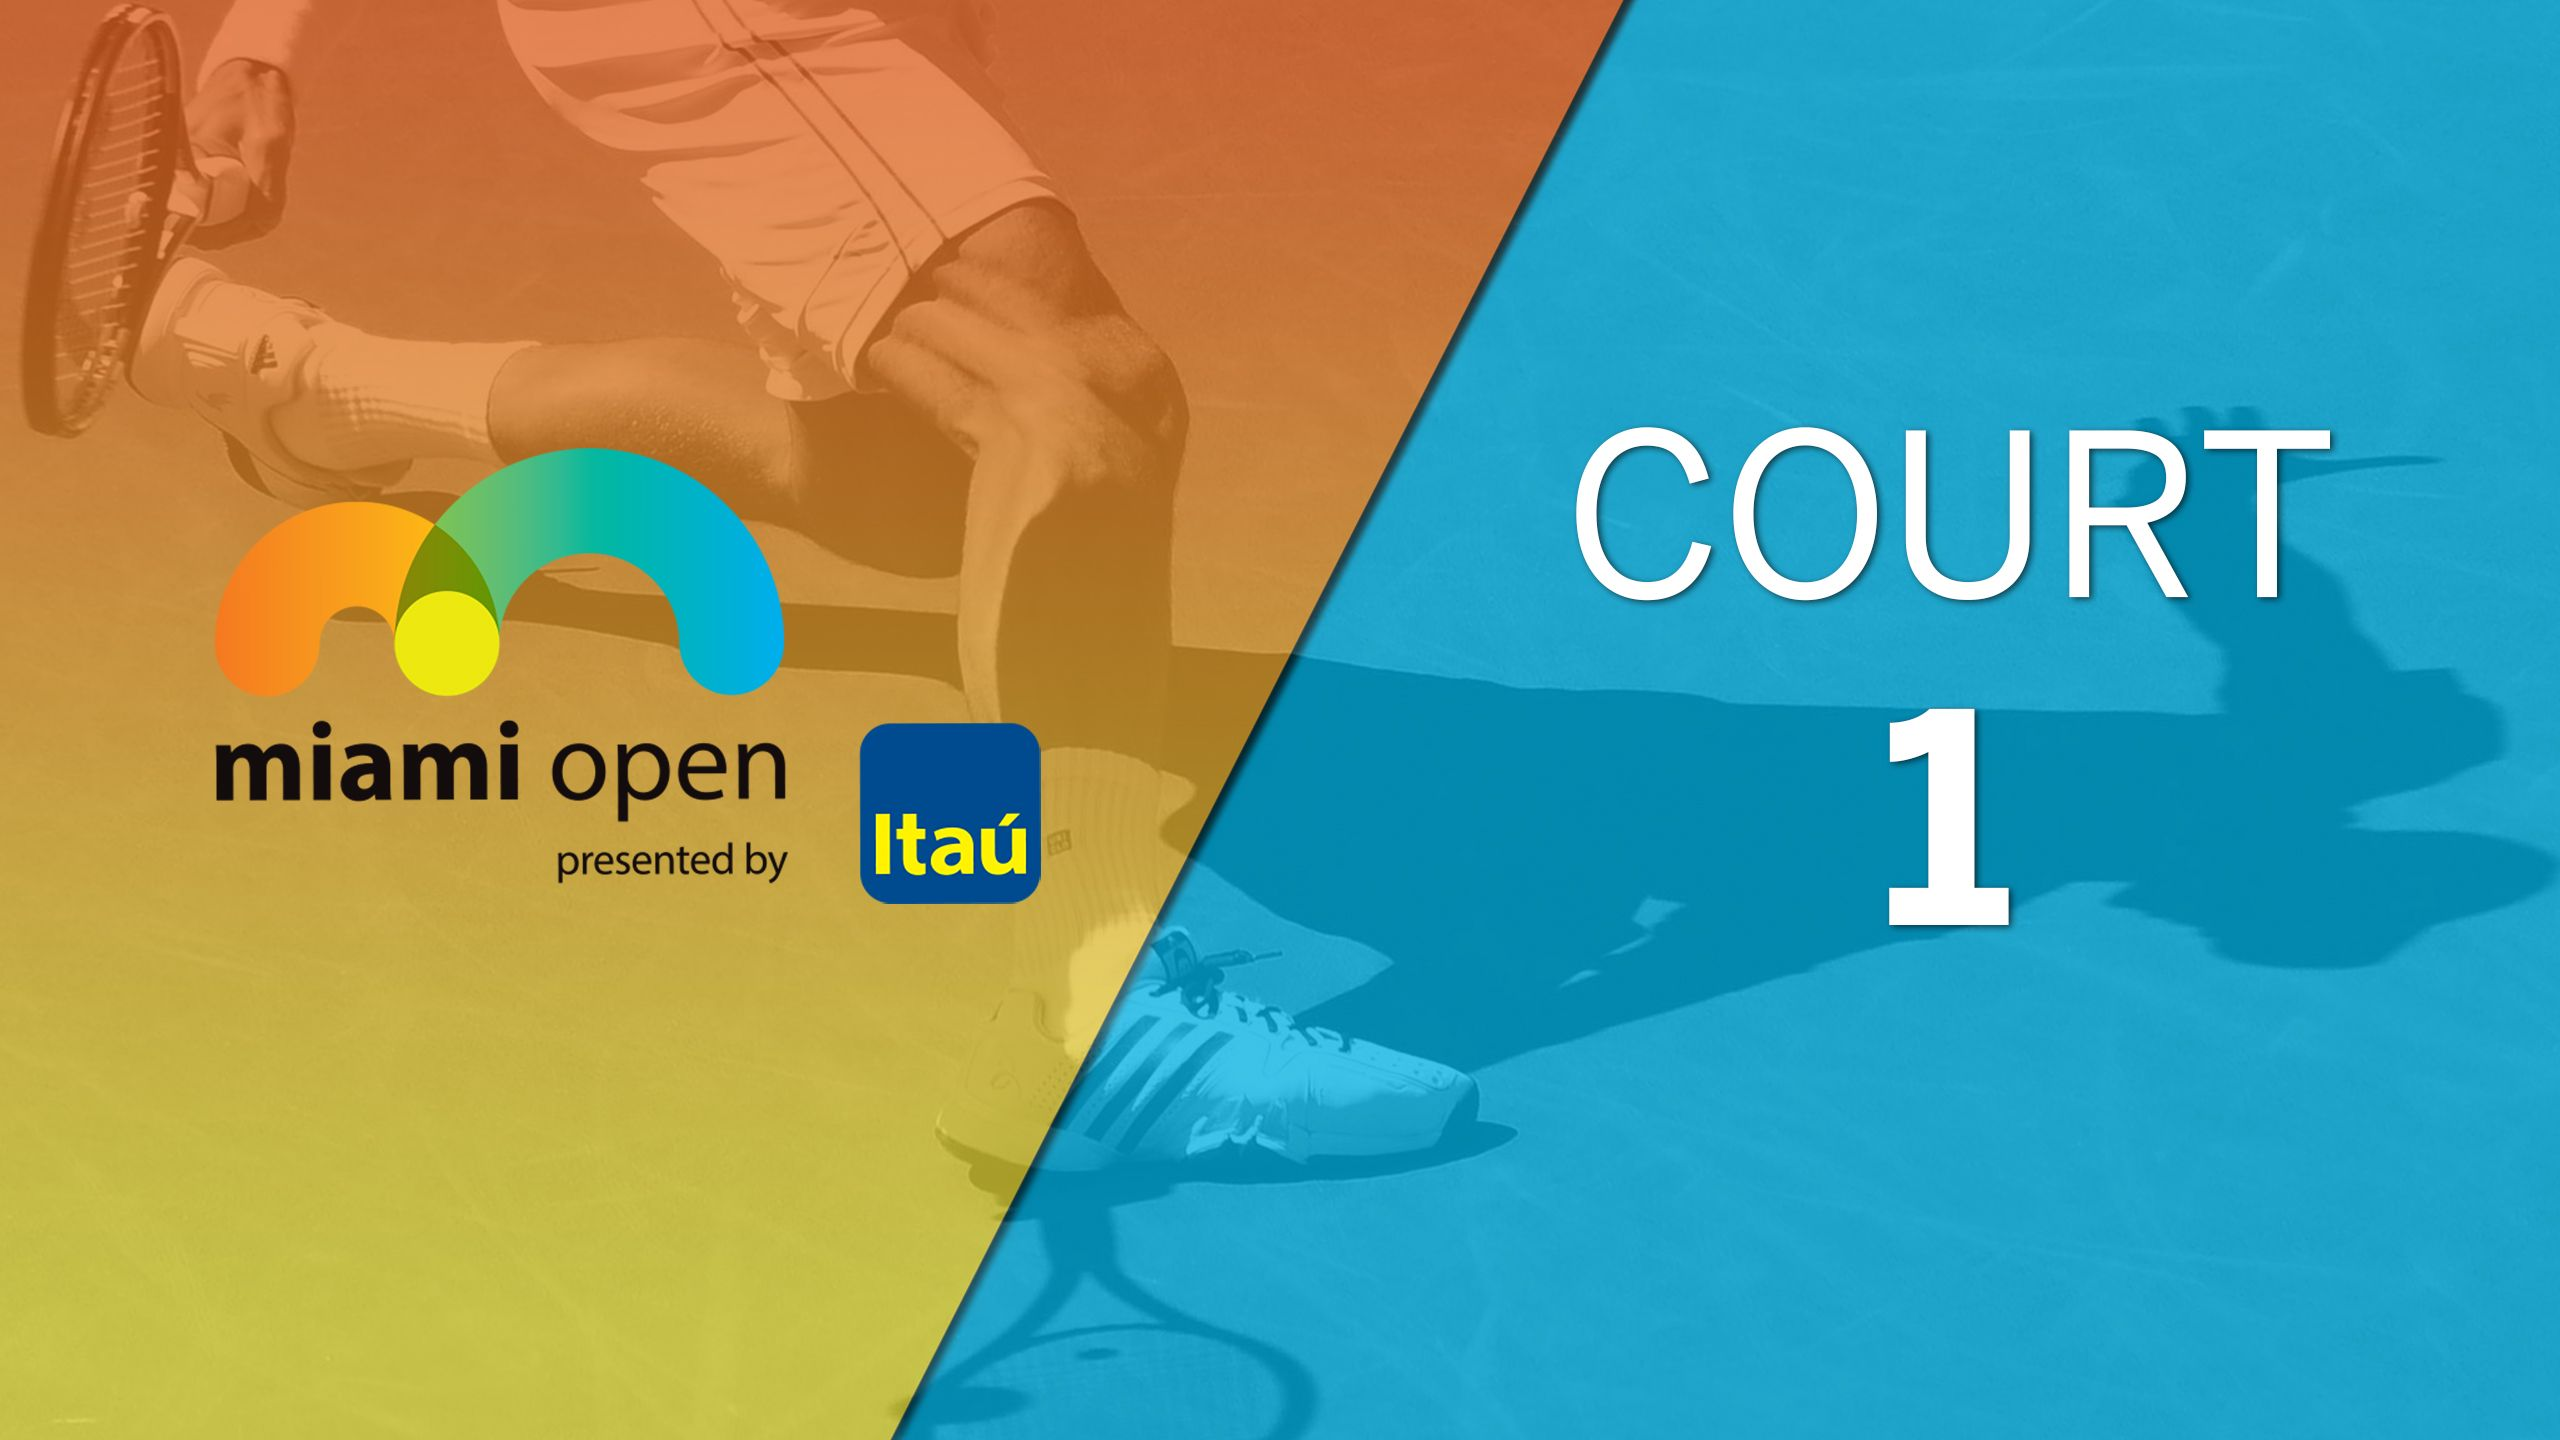 Miami Open - Court 1 (Second Round)